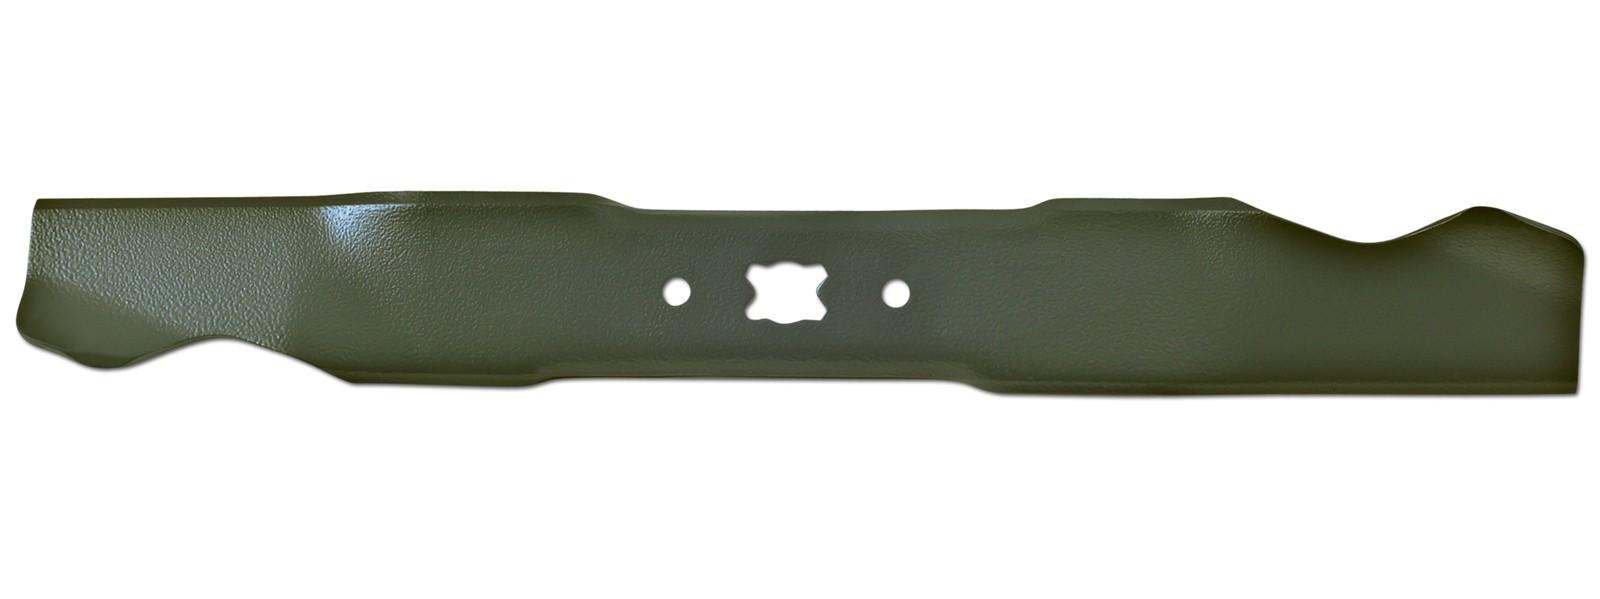 MTD Ersatzmesser für Rasenmäher MTD Mulchmäher SB 46cm Bild 1